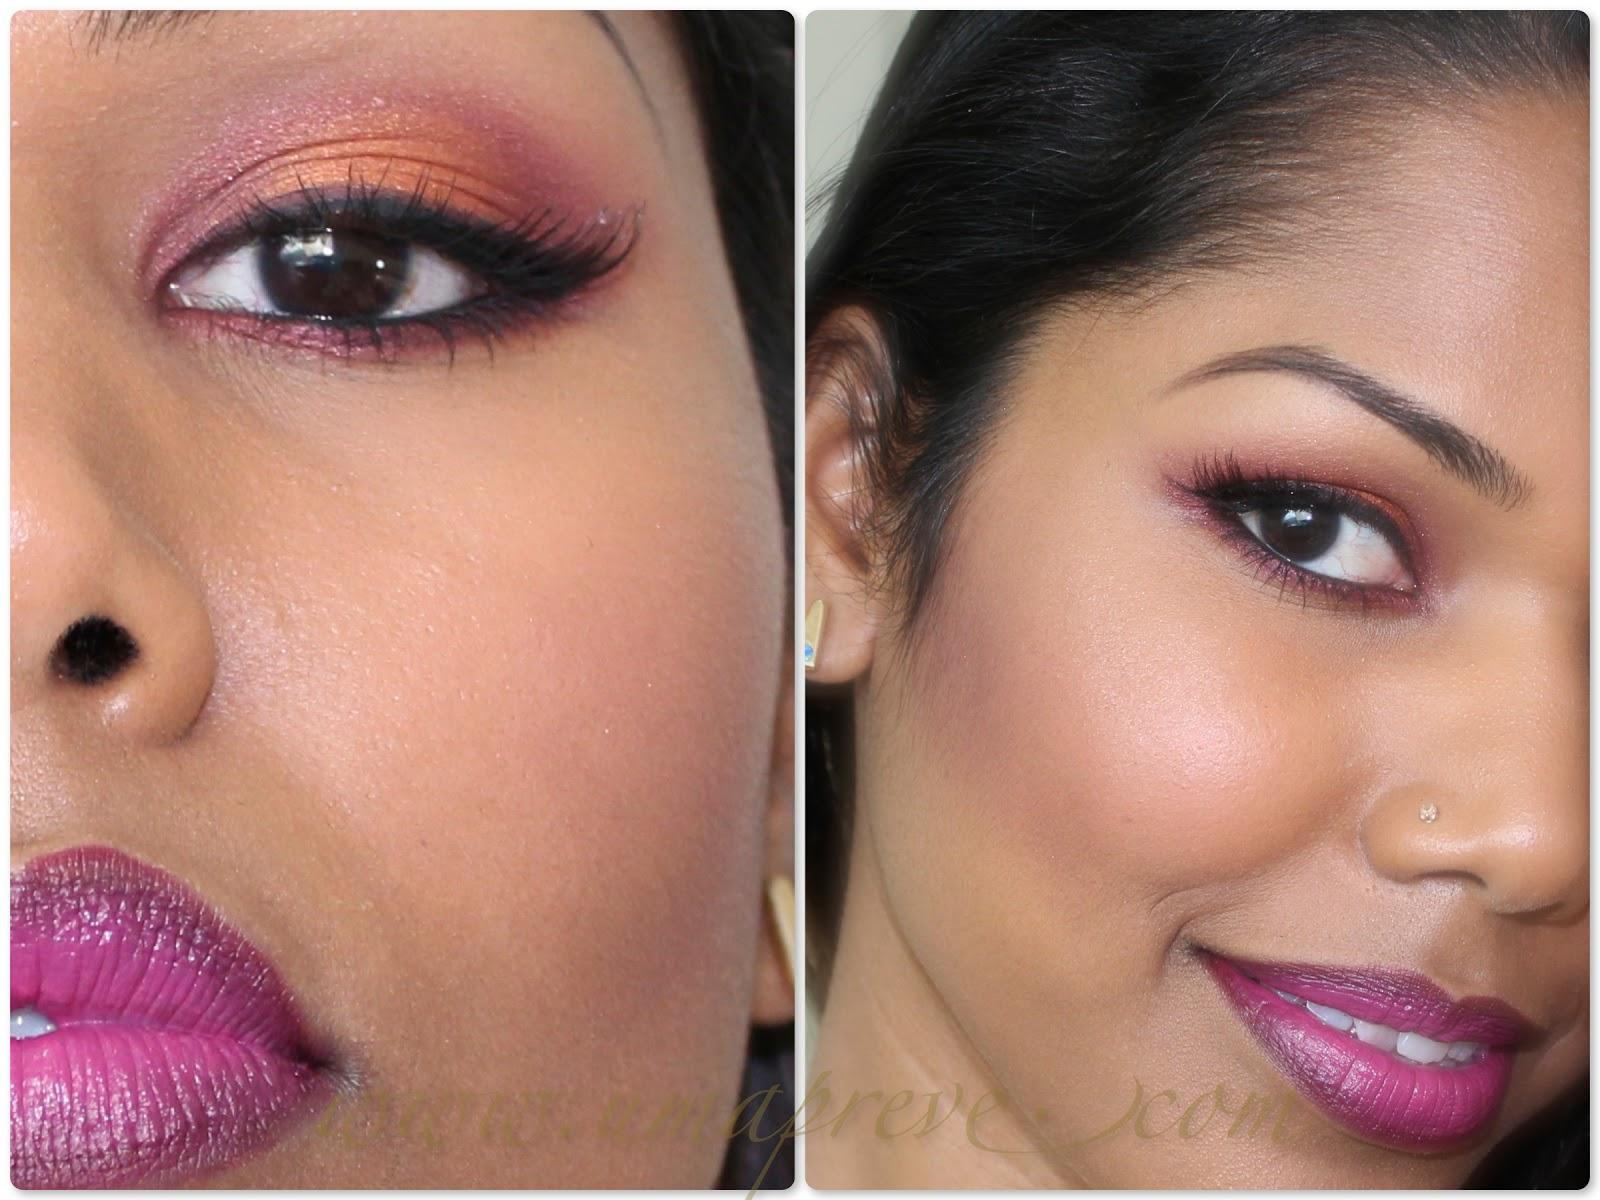 Umapreve berry tone makeup full face tutorial berry tone makeup full face tutorial baditri Image collections